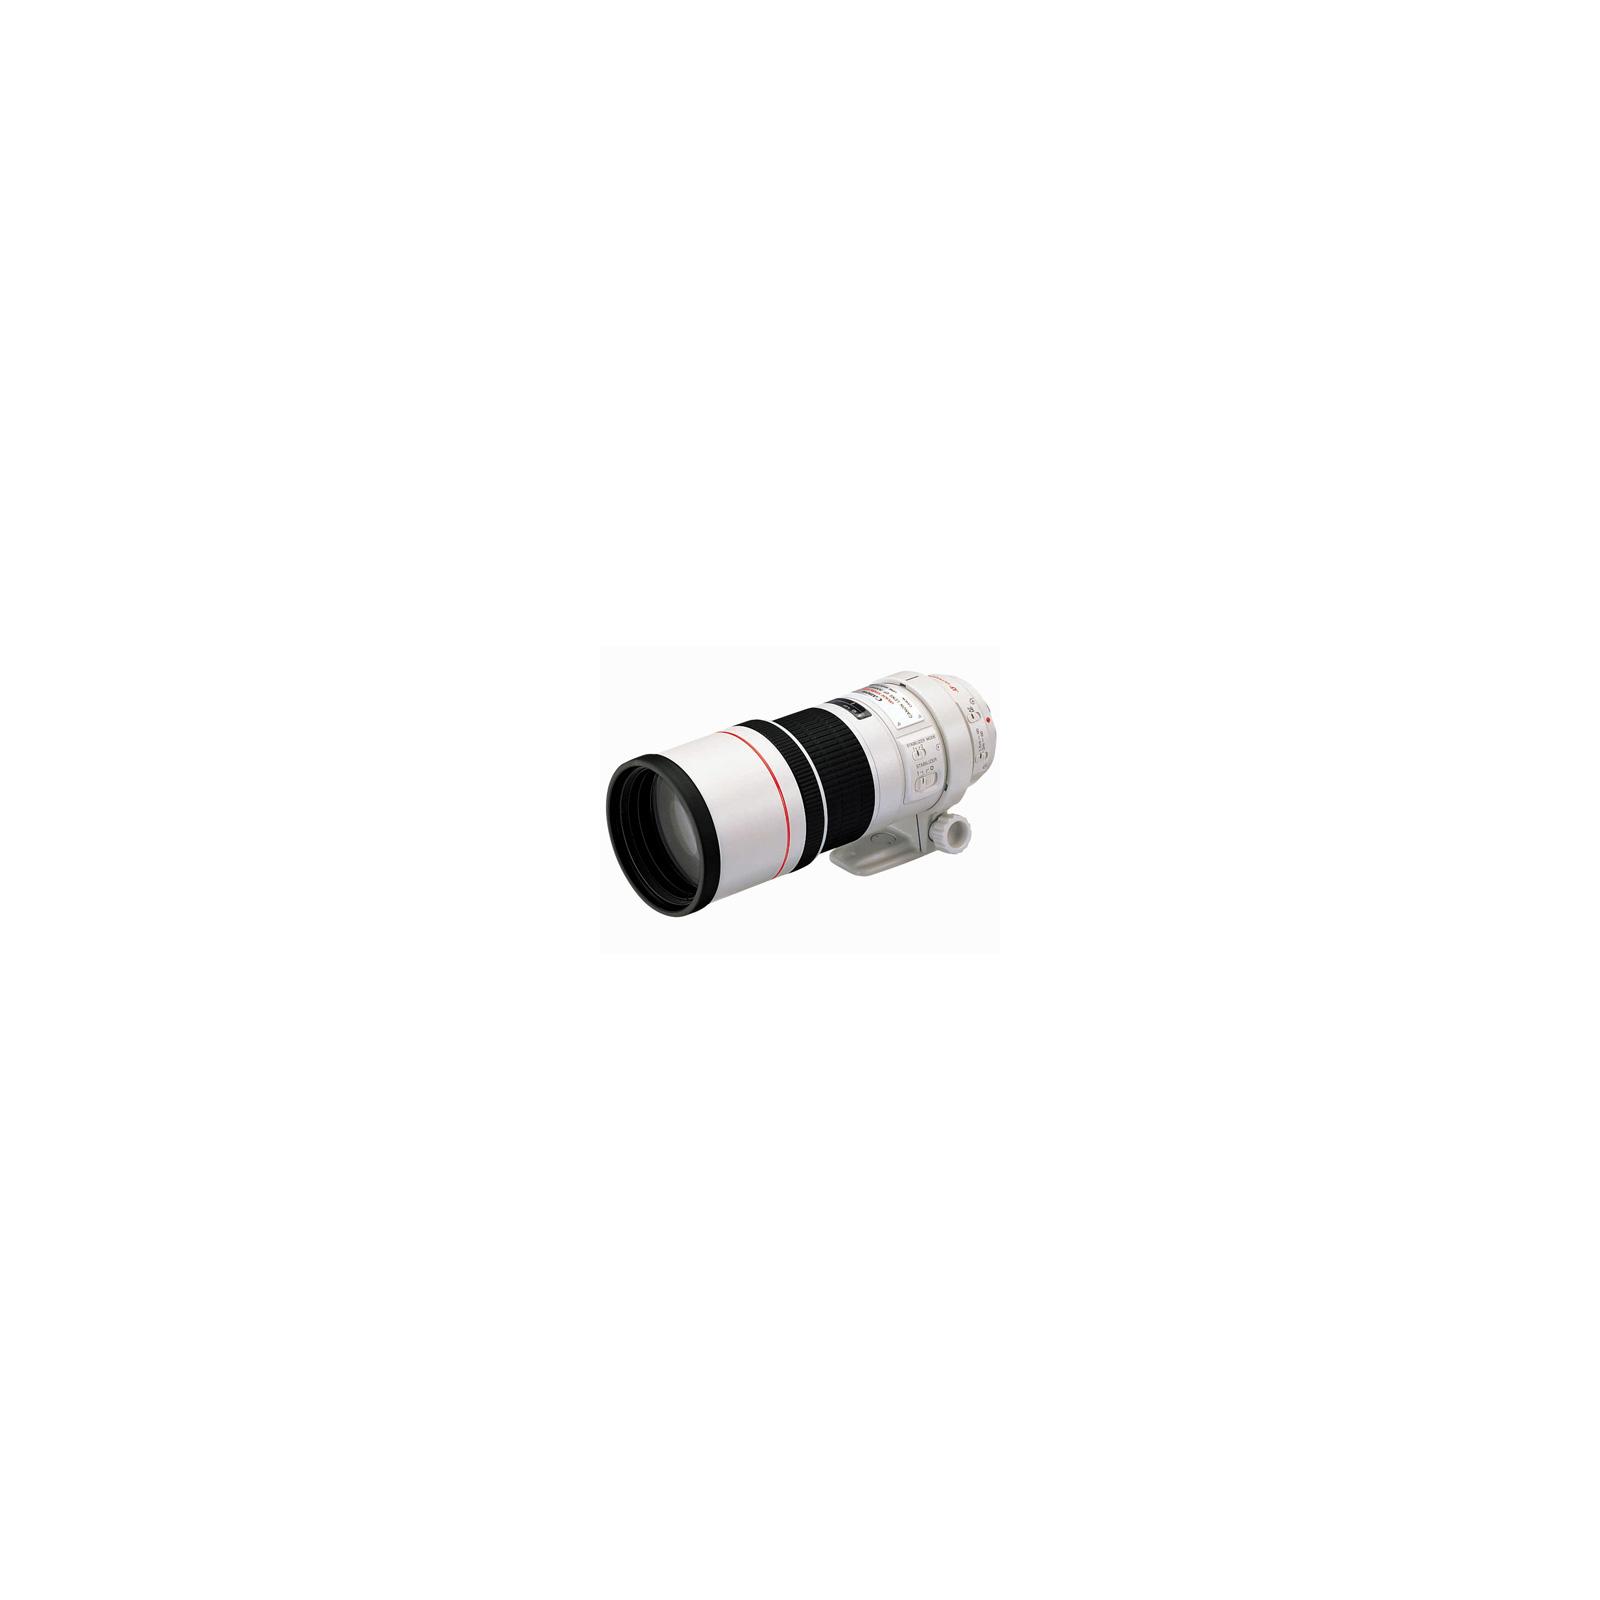 Объектив Canon EF 300mm f/4.0L USM IS (2530A017)